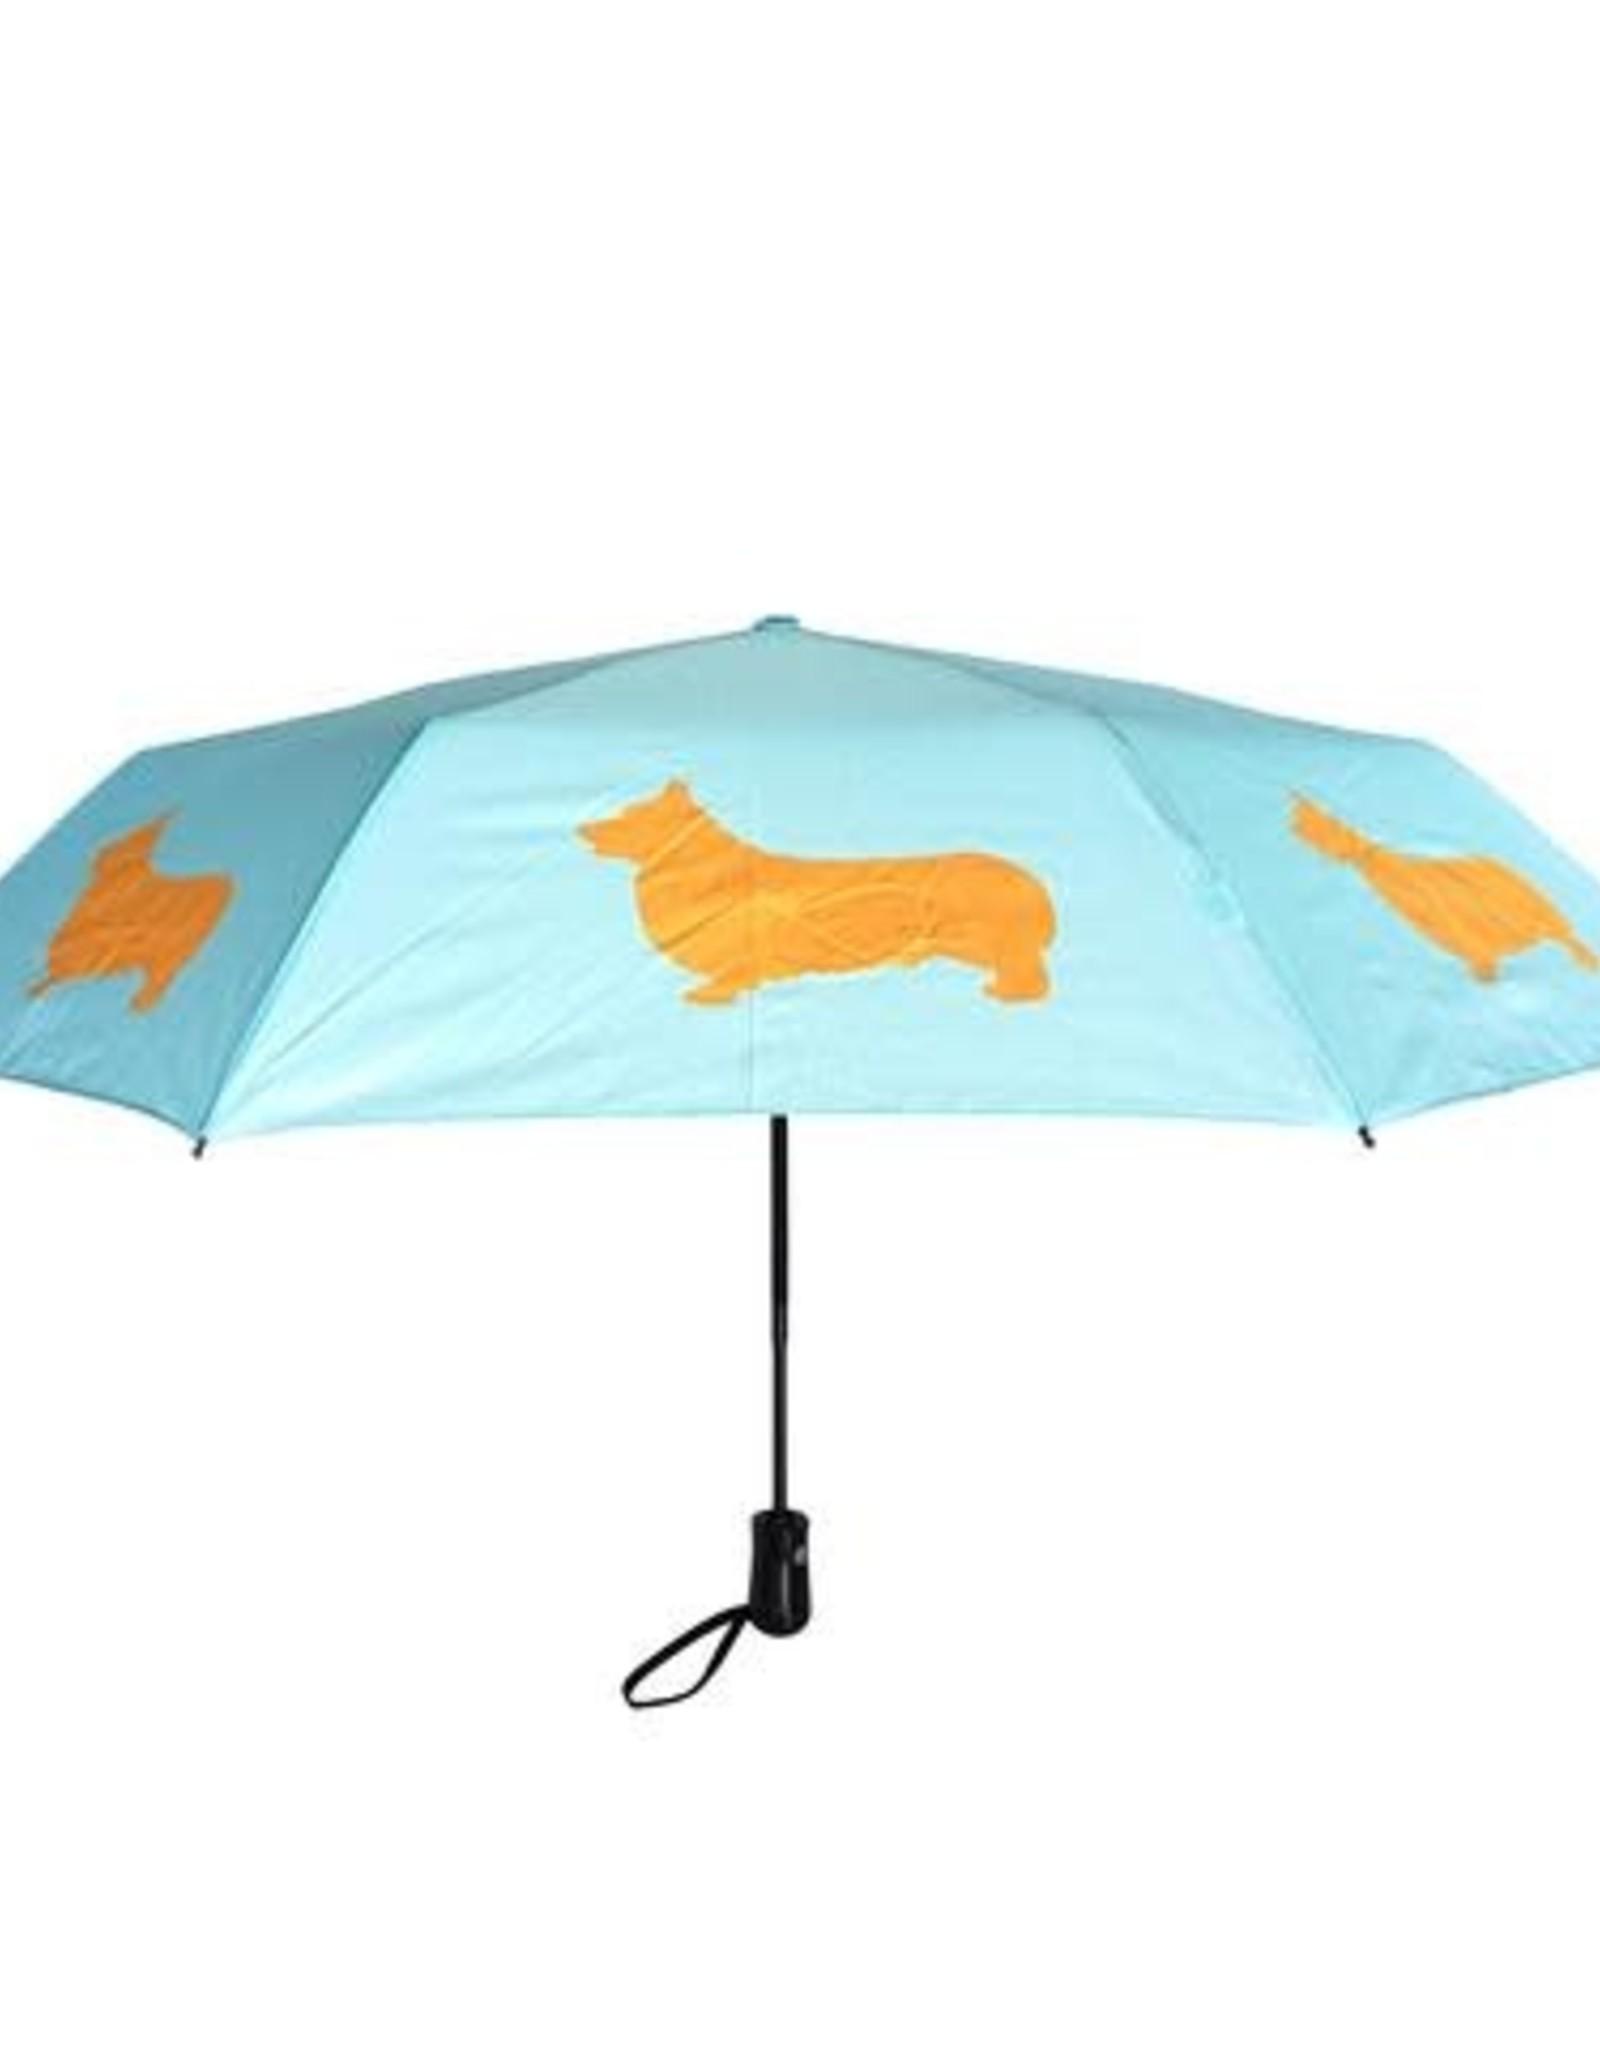 San Francisco Umbrella Company SFUC Collapsible Umbrella with Auto Open Welsh Corgi